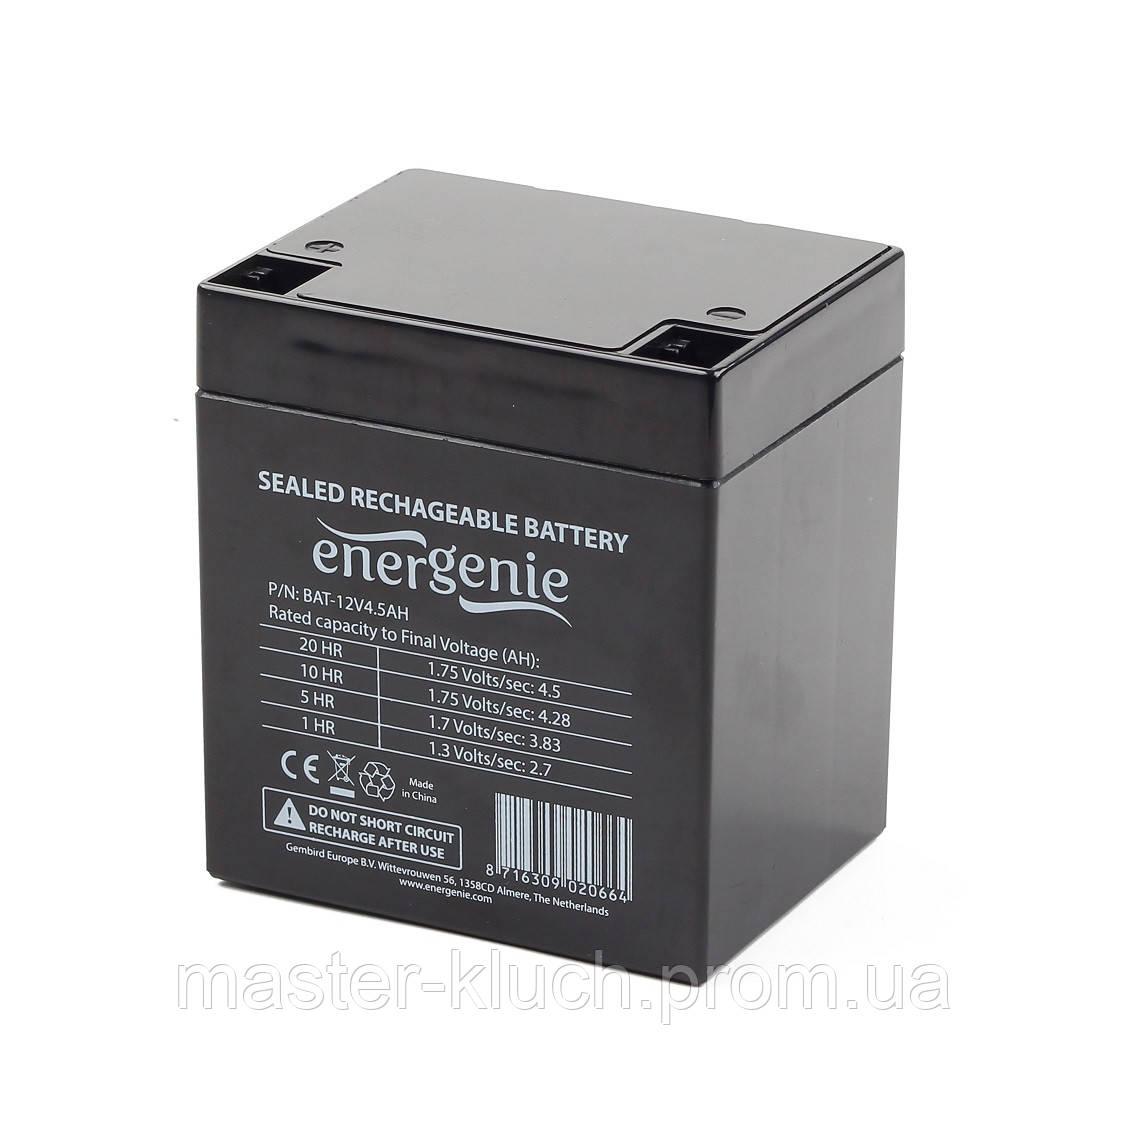 Аккумулятор EnerGenie BAT-12V4.5AH 12V 4.5Ah